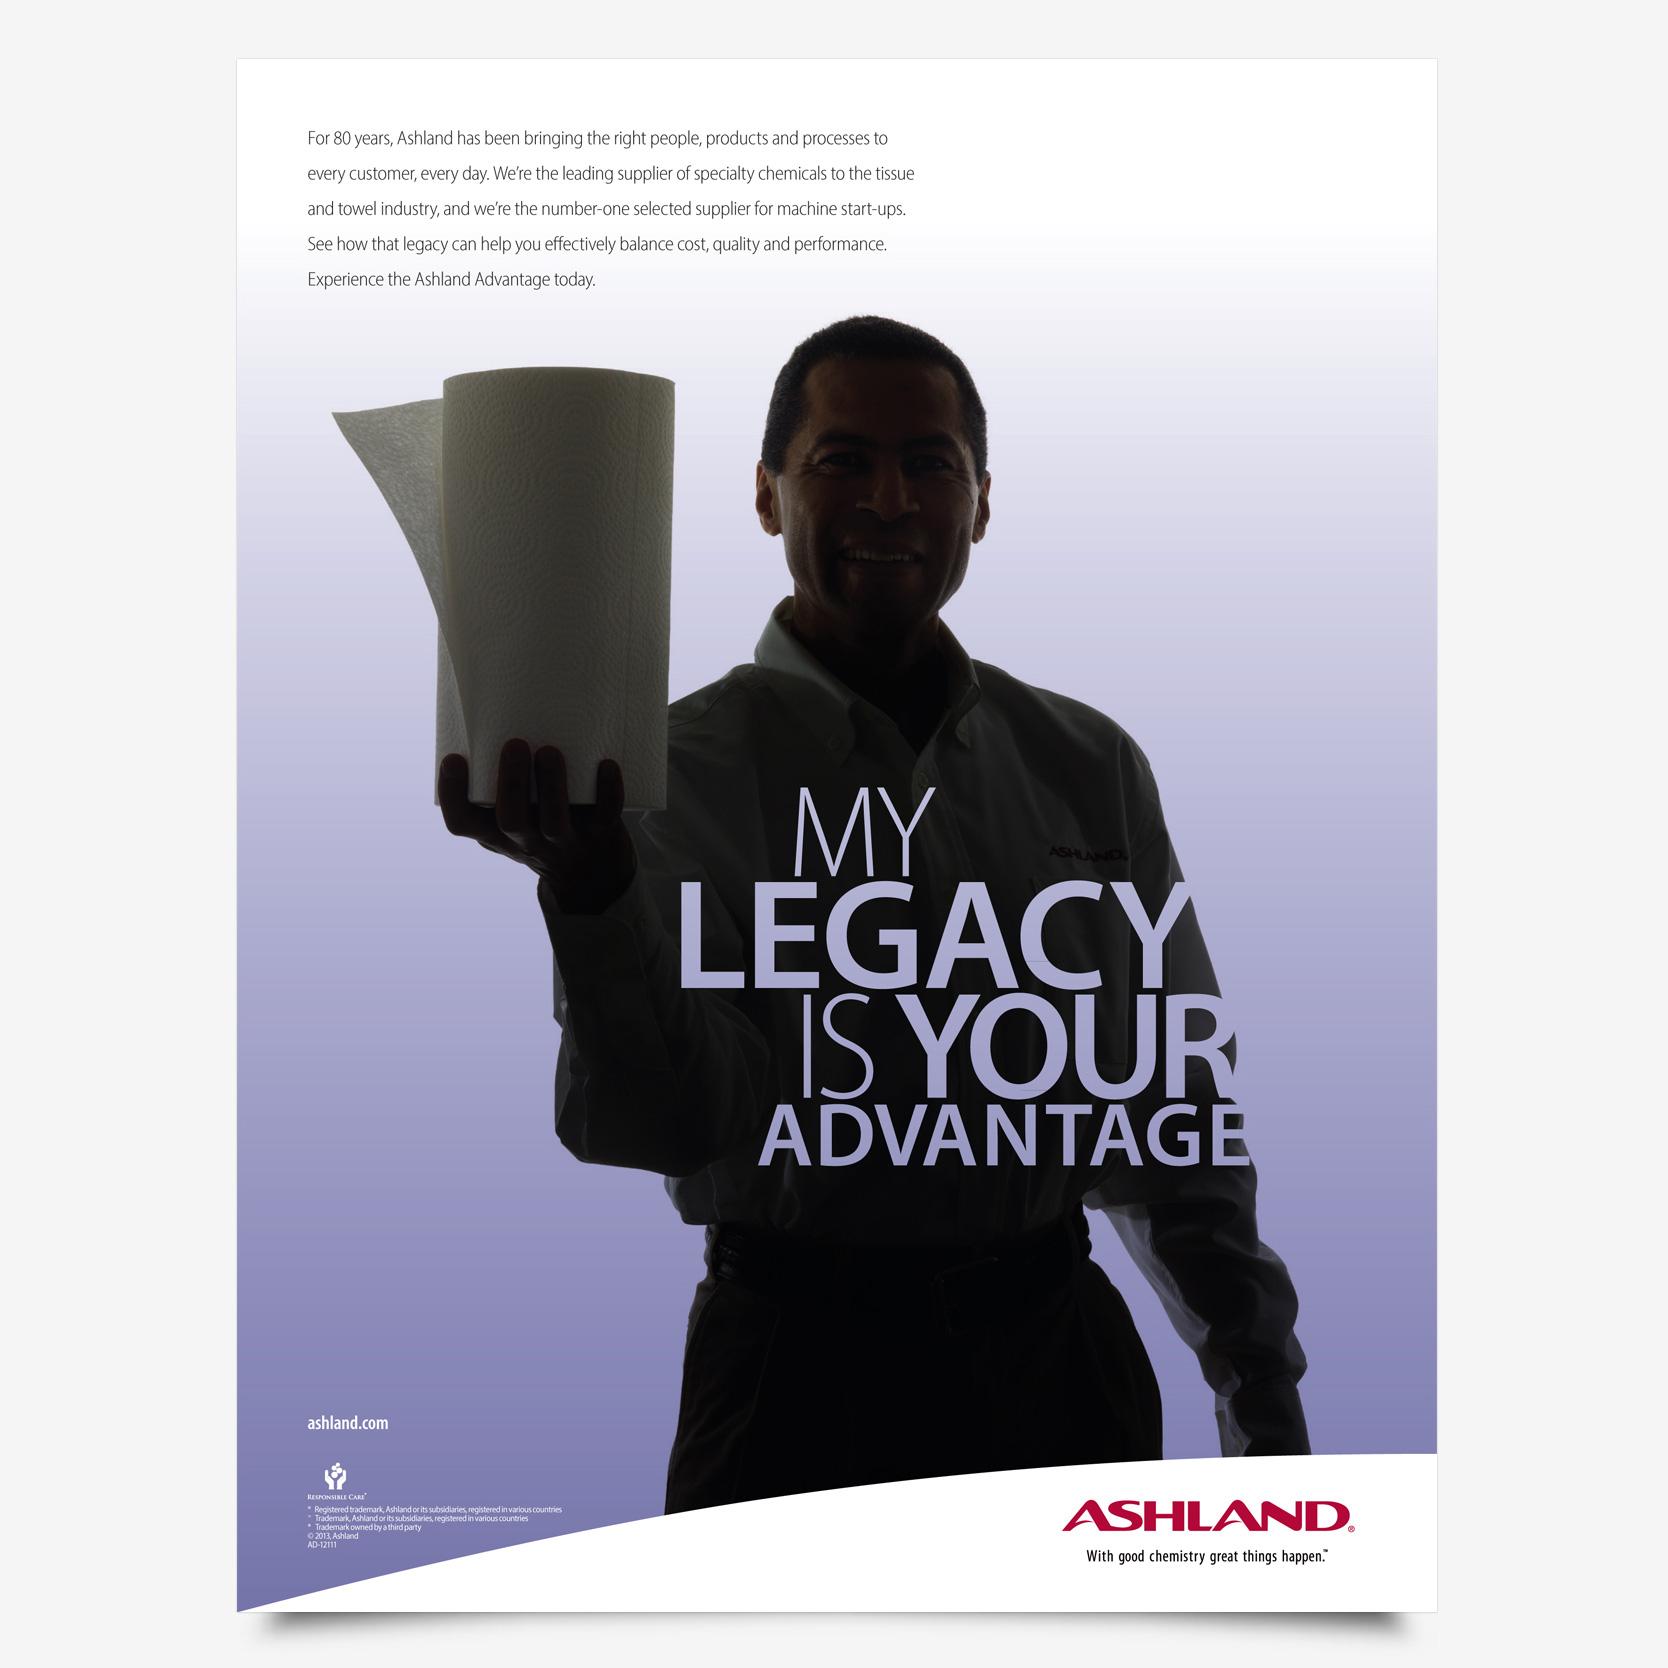 Ashland_Retail_Ads3.jpg